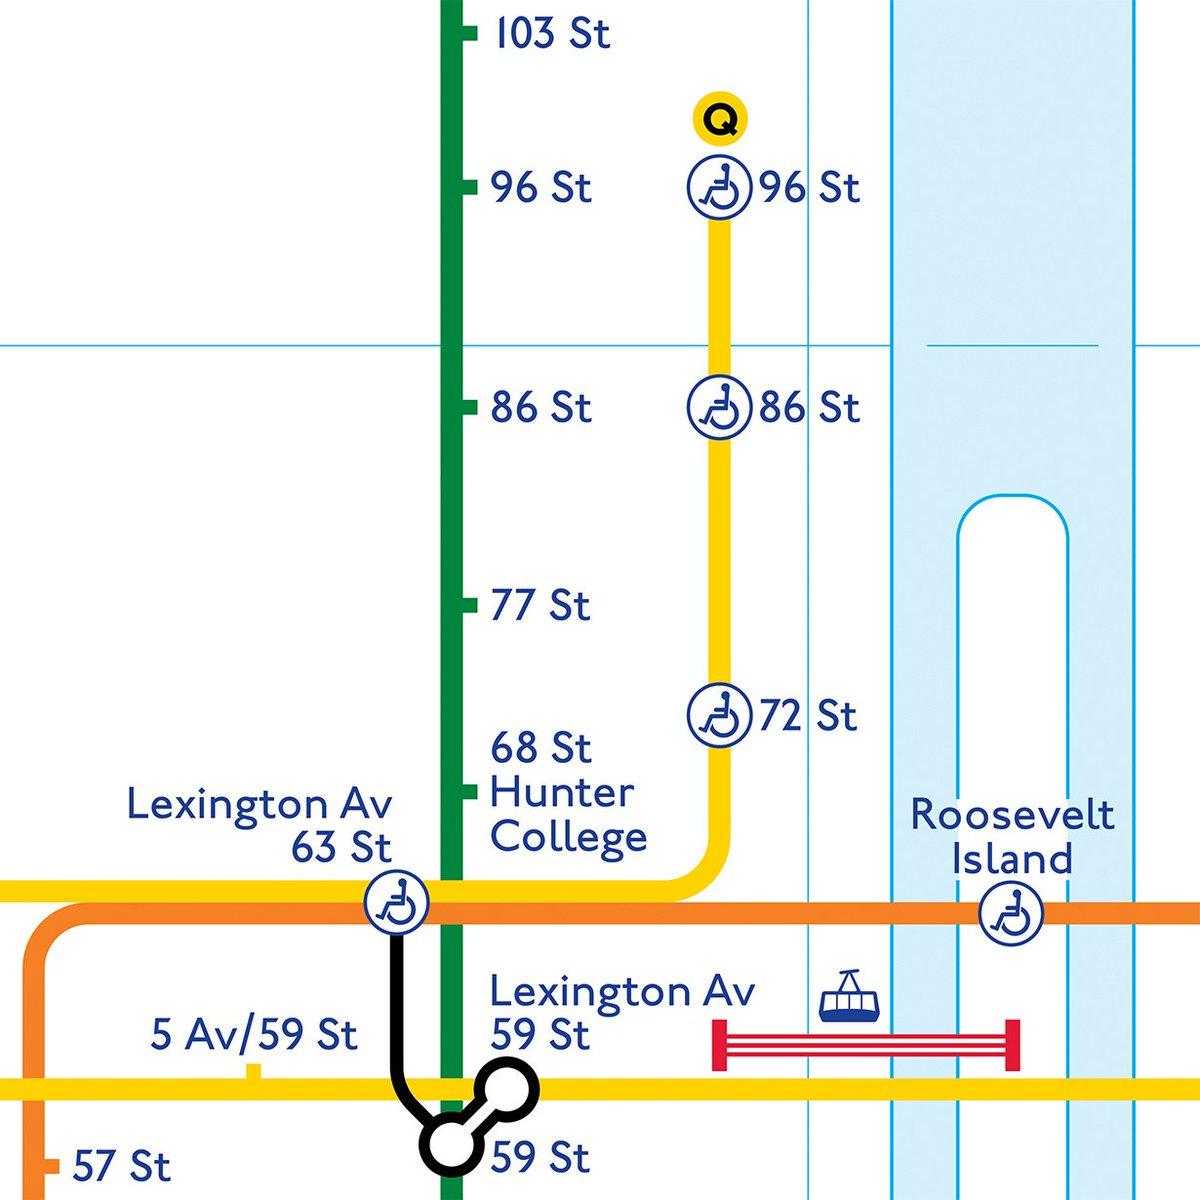 Subway Map 77 Street.Transit Maps On Twitter Okay Updates And Edits To My New York